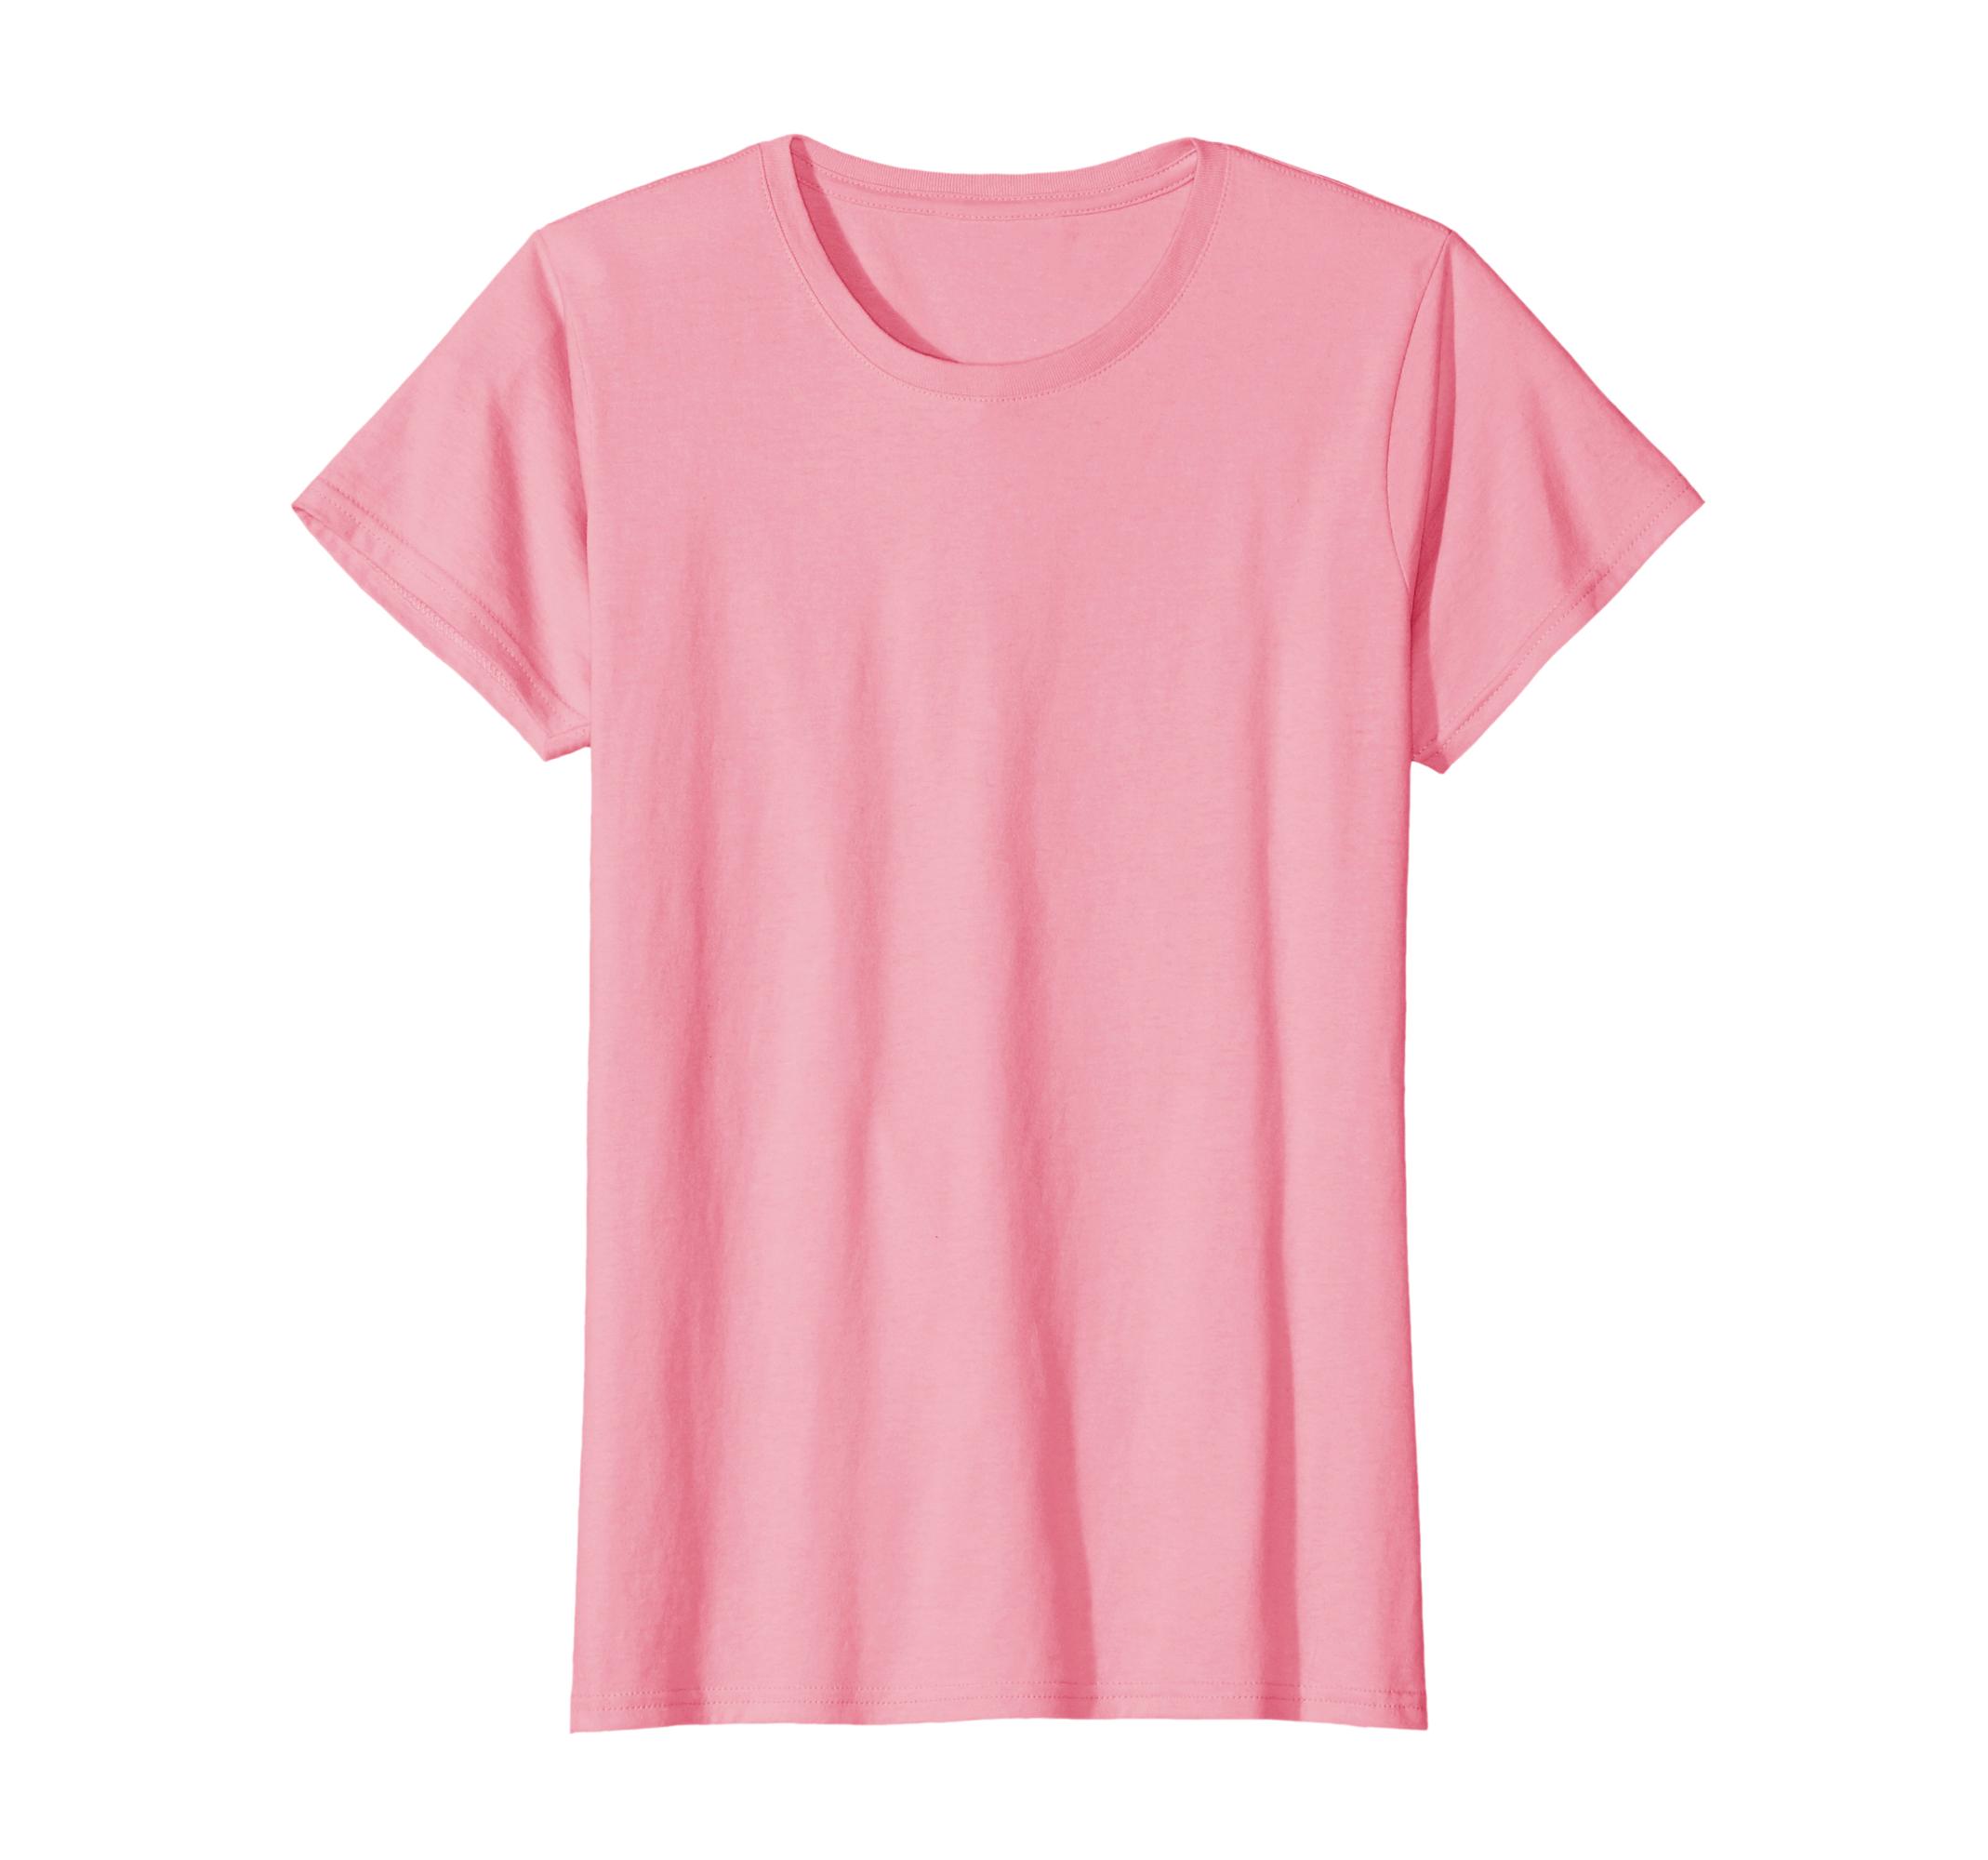 Shhh I Have A Secret CafePress 100/% Cotton Pink - Cute Toddler T-Shirt